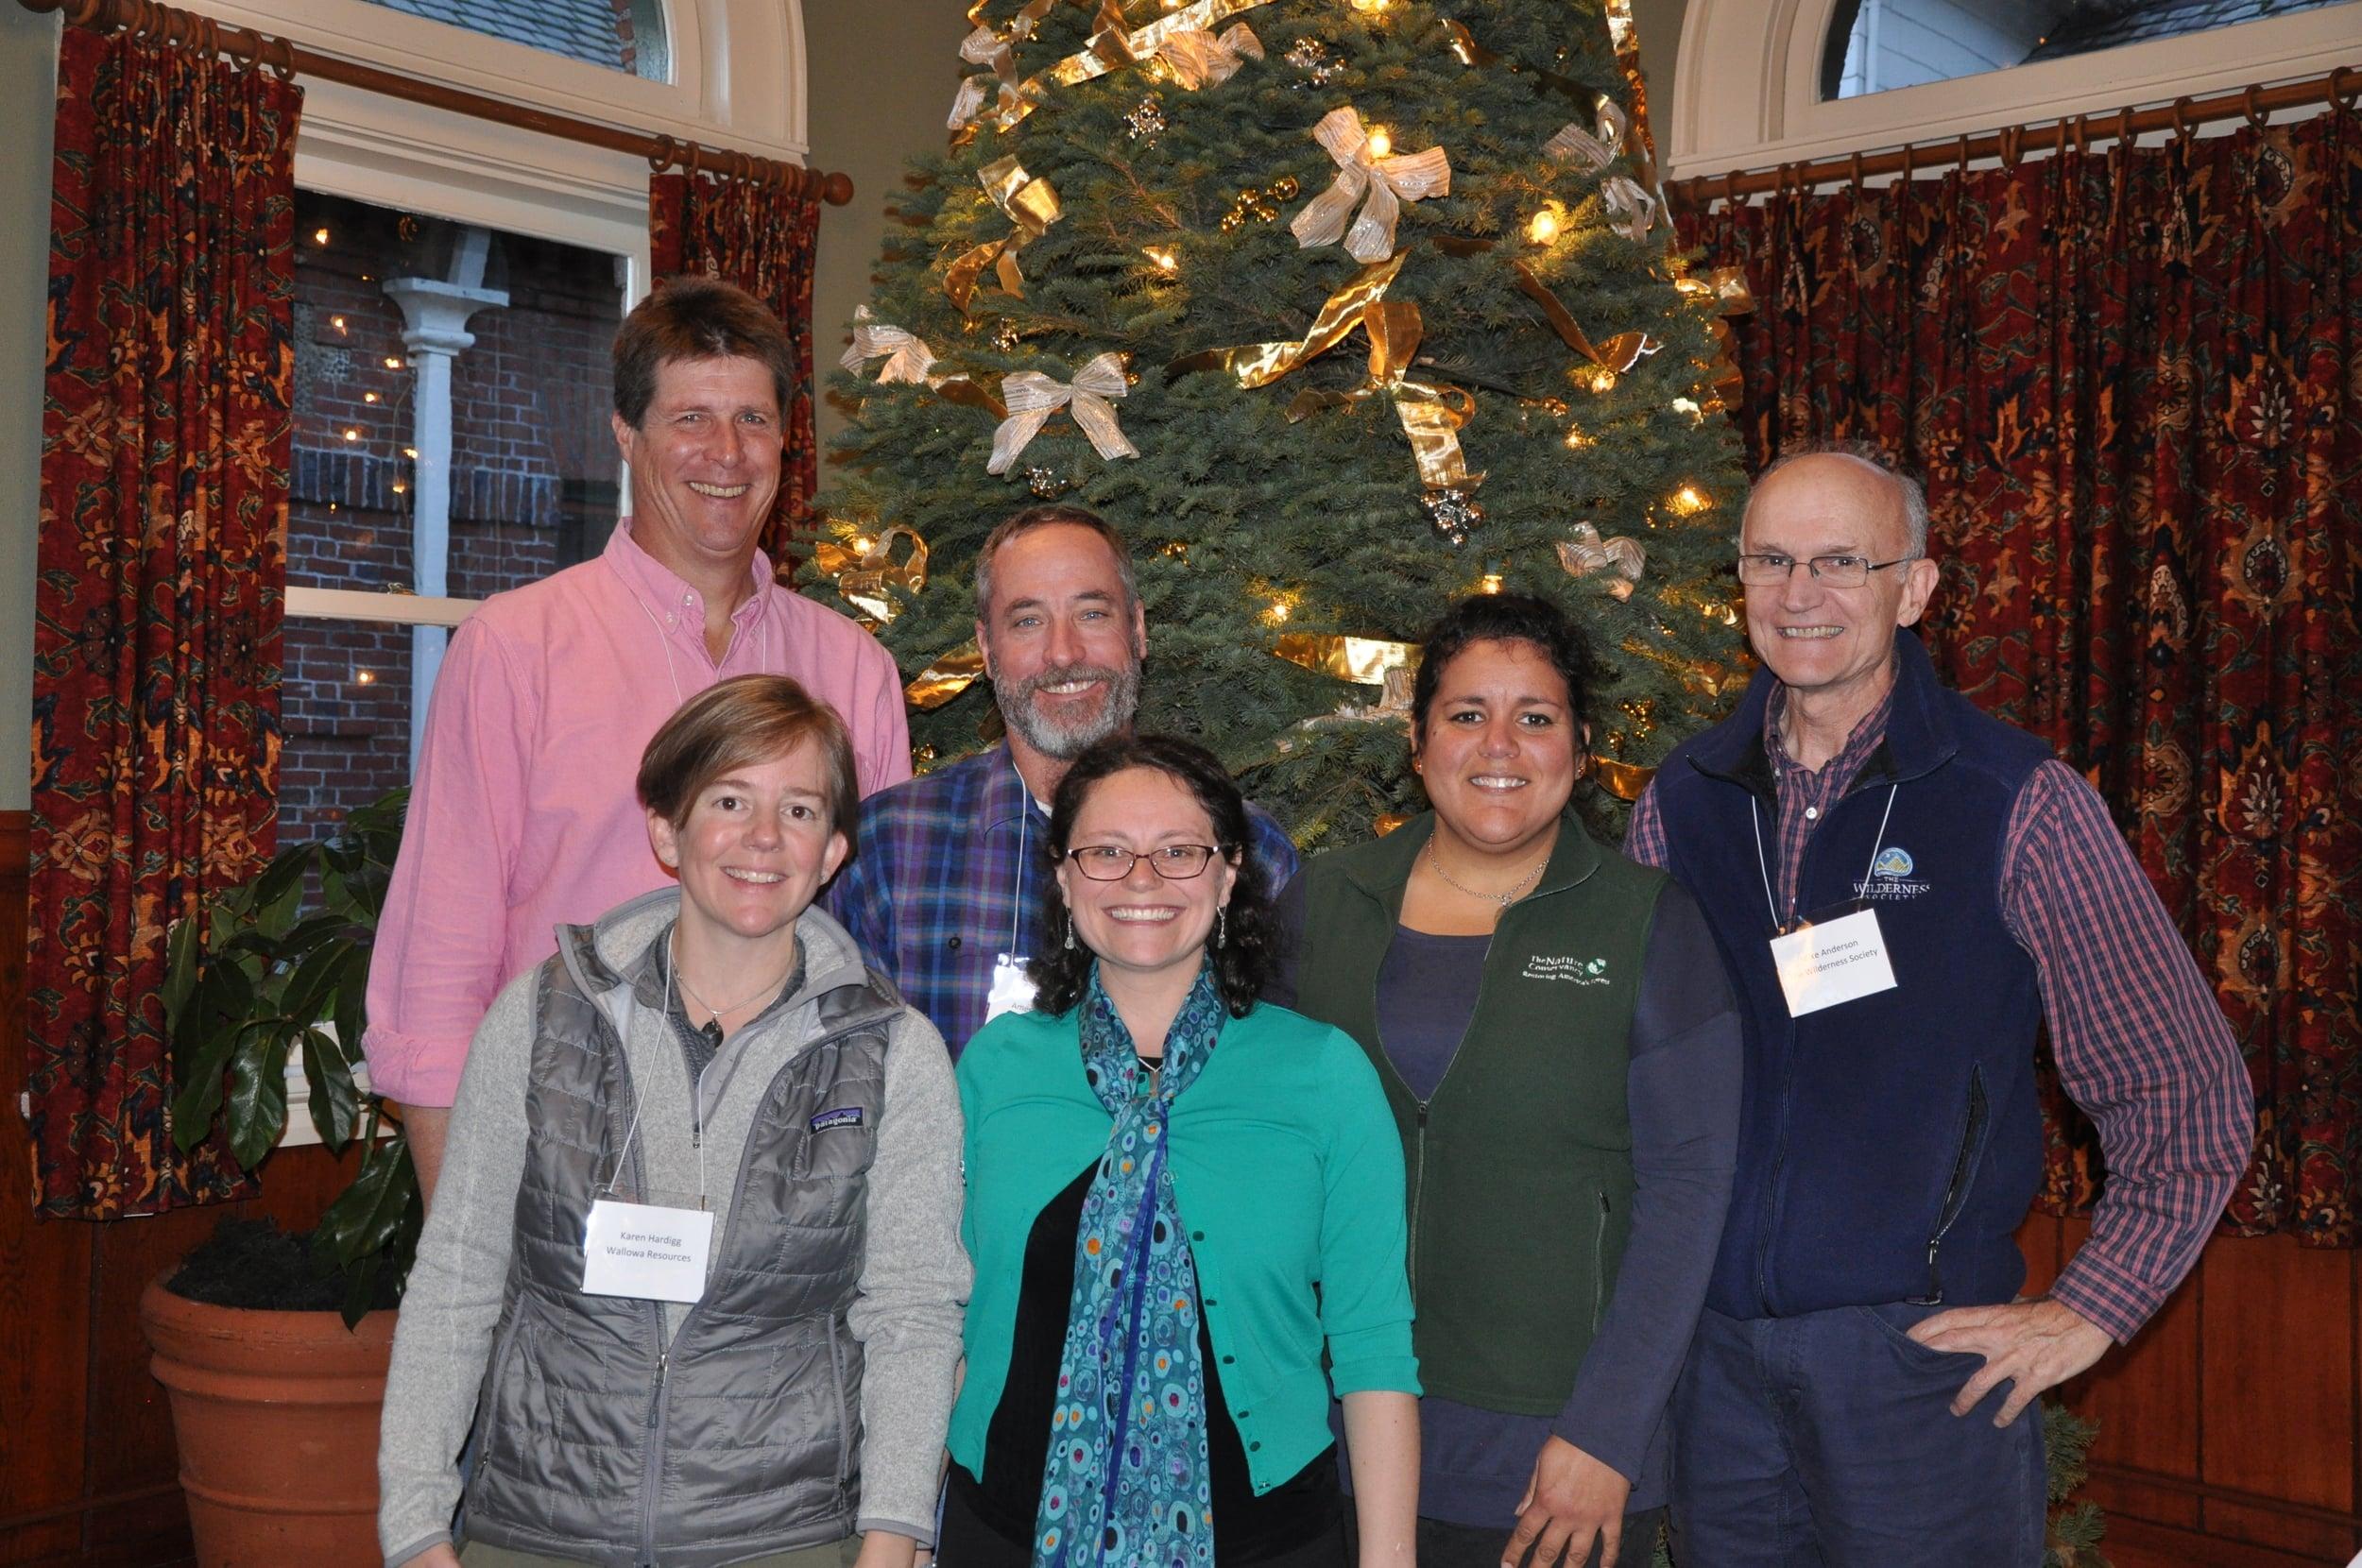 (From left) Greg Aplet, Karen Hardigg, Tom Fry, Meryl Harrell, Cecilia Clavet, and Mike Anderson